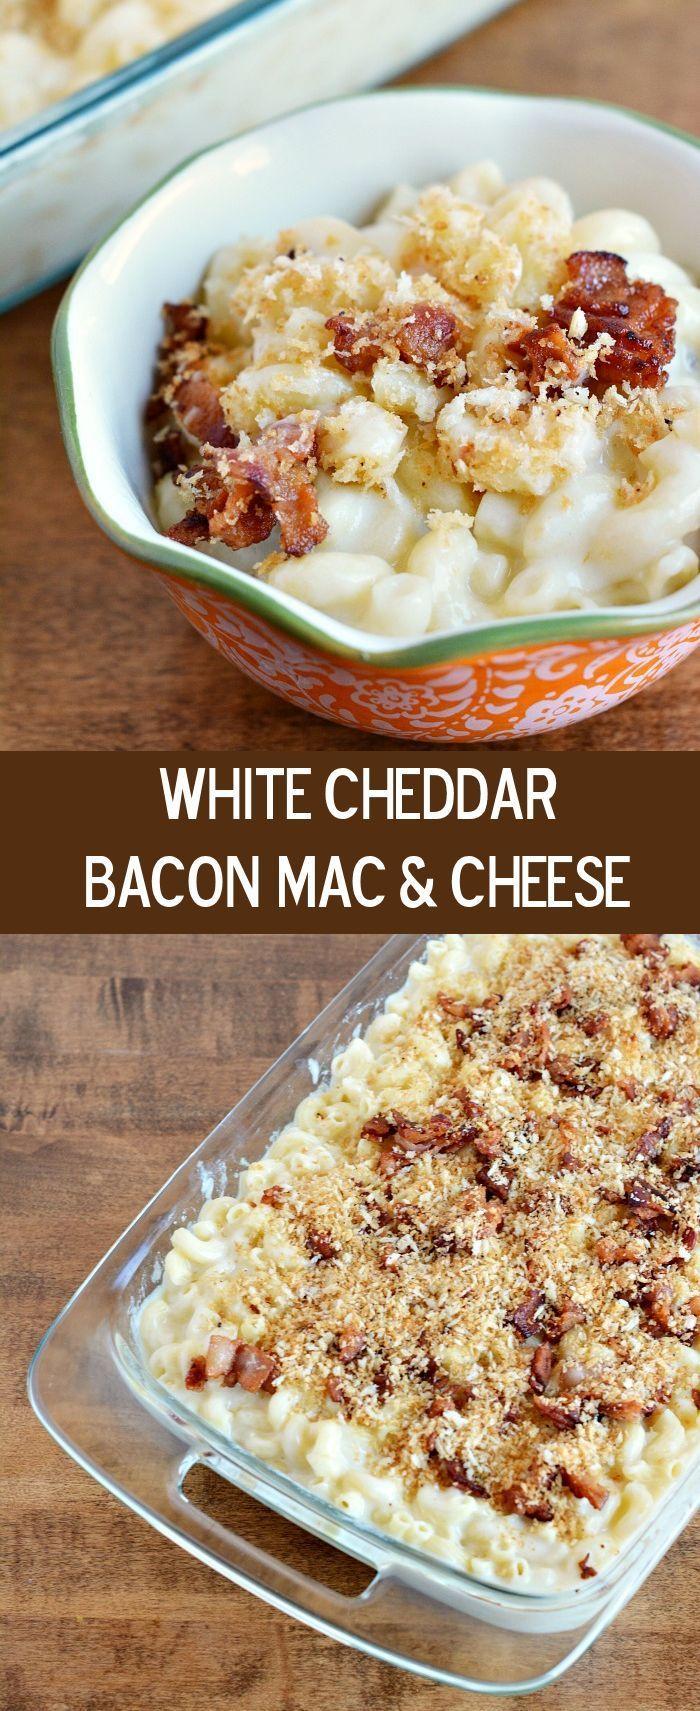 White Cheddar Bacon Macaroni And Cheese Recipe Food Macaroni